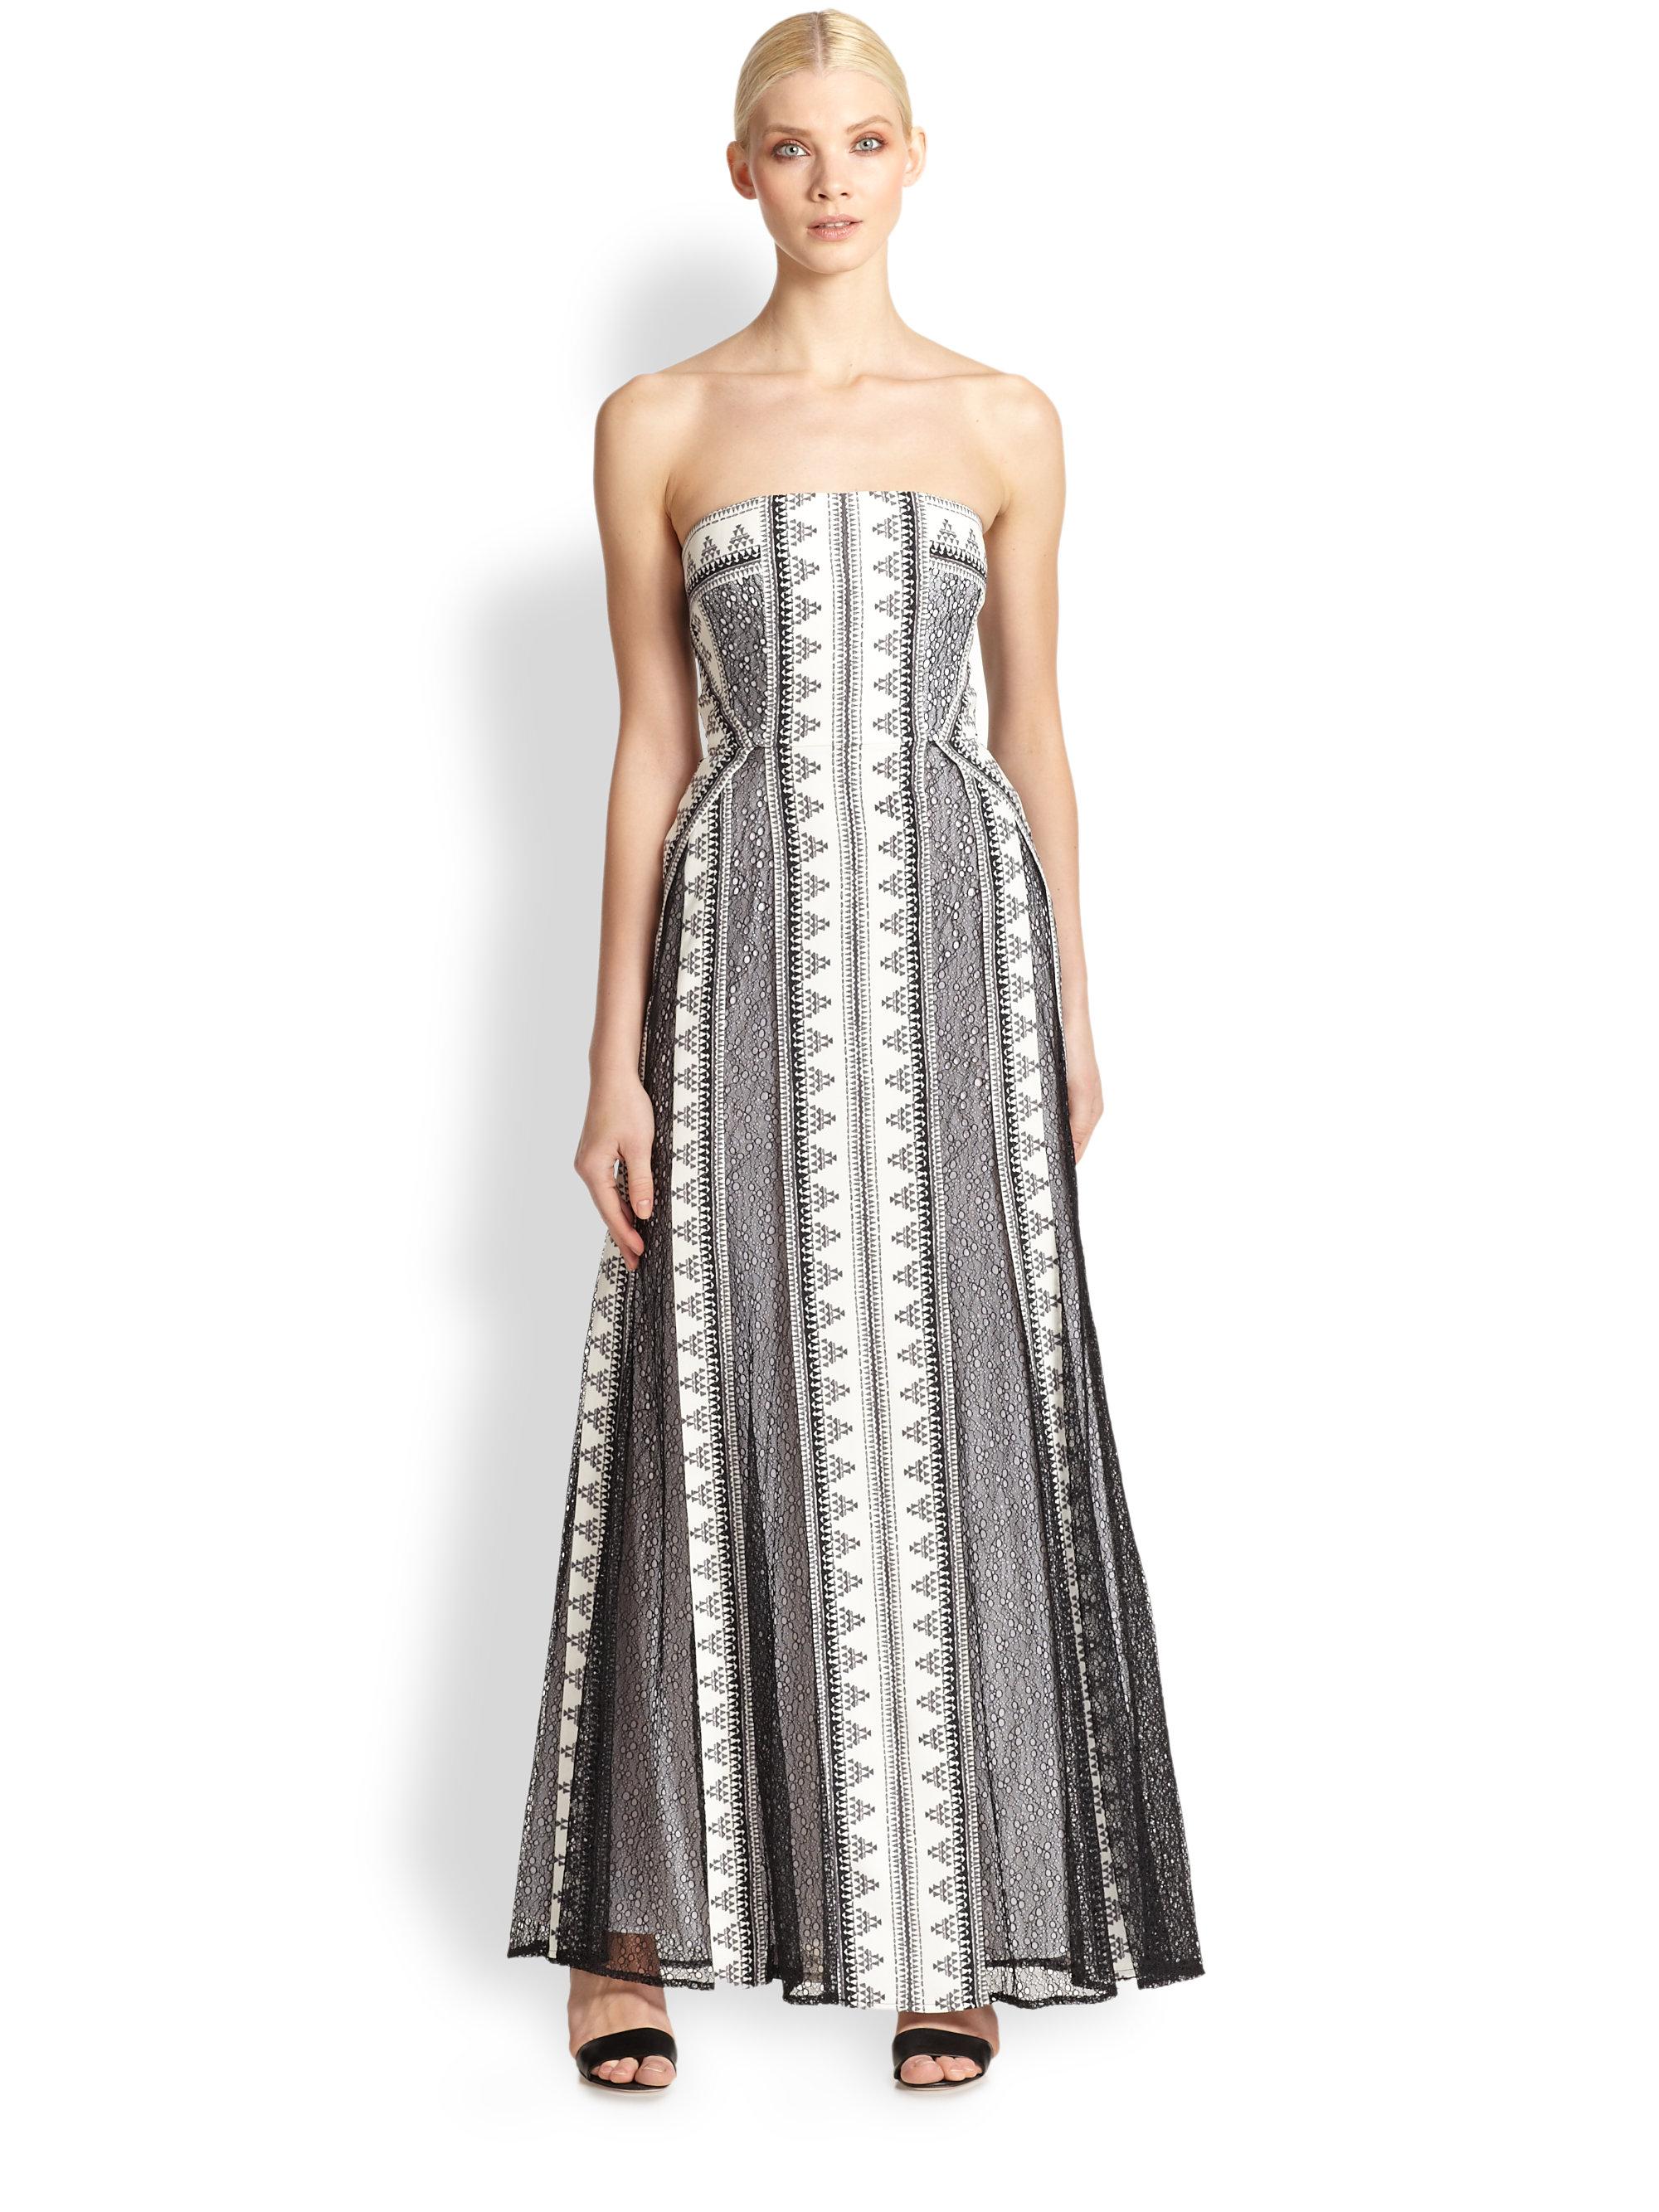 Lyst - Bcbgmaxazria Kia Lace Overlay Strapless Gown in White